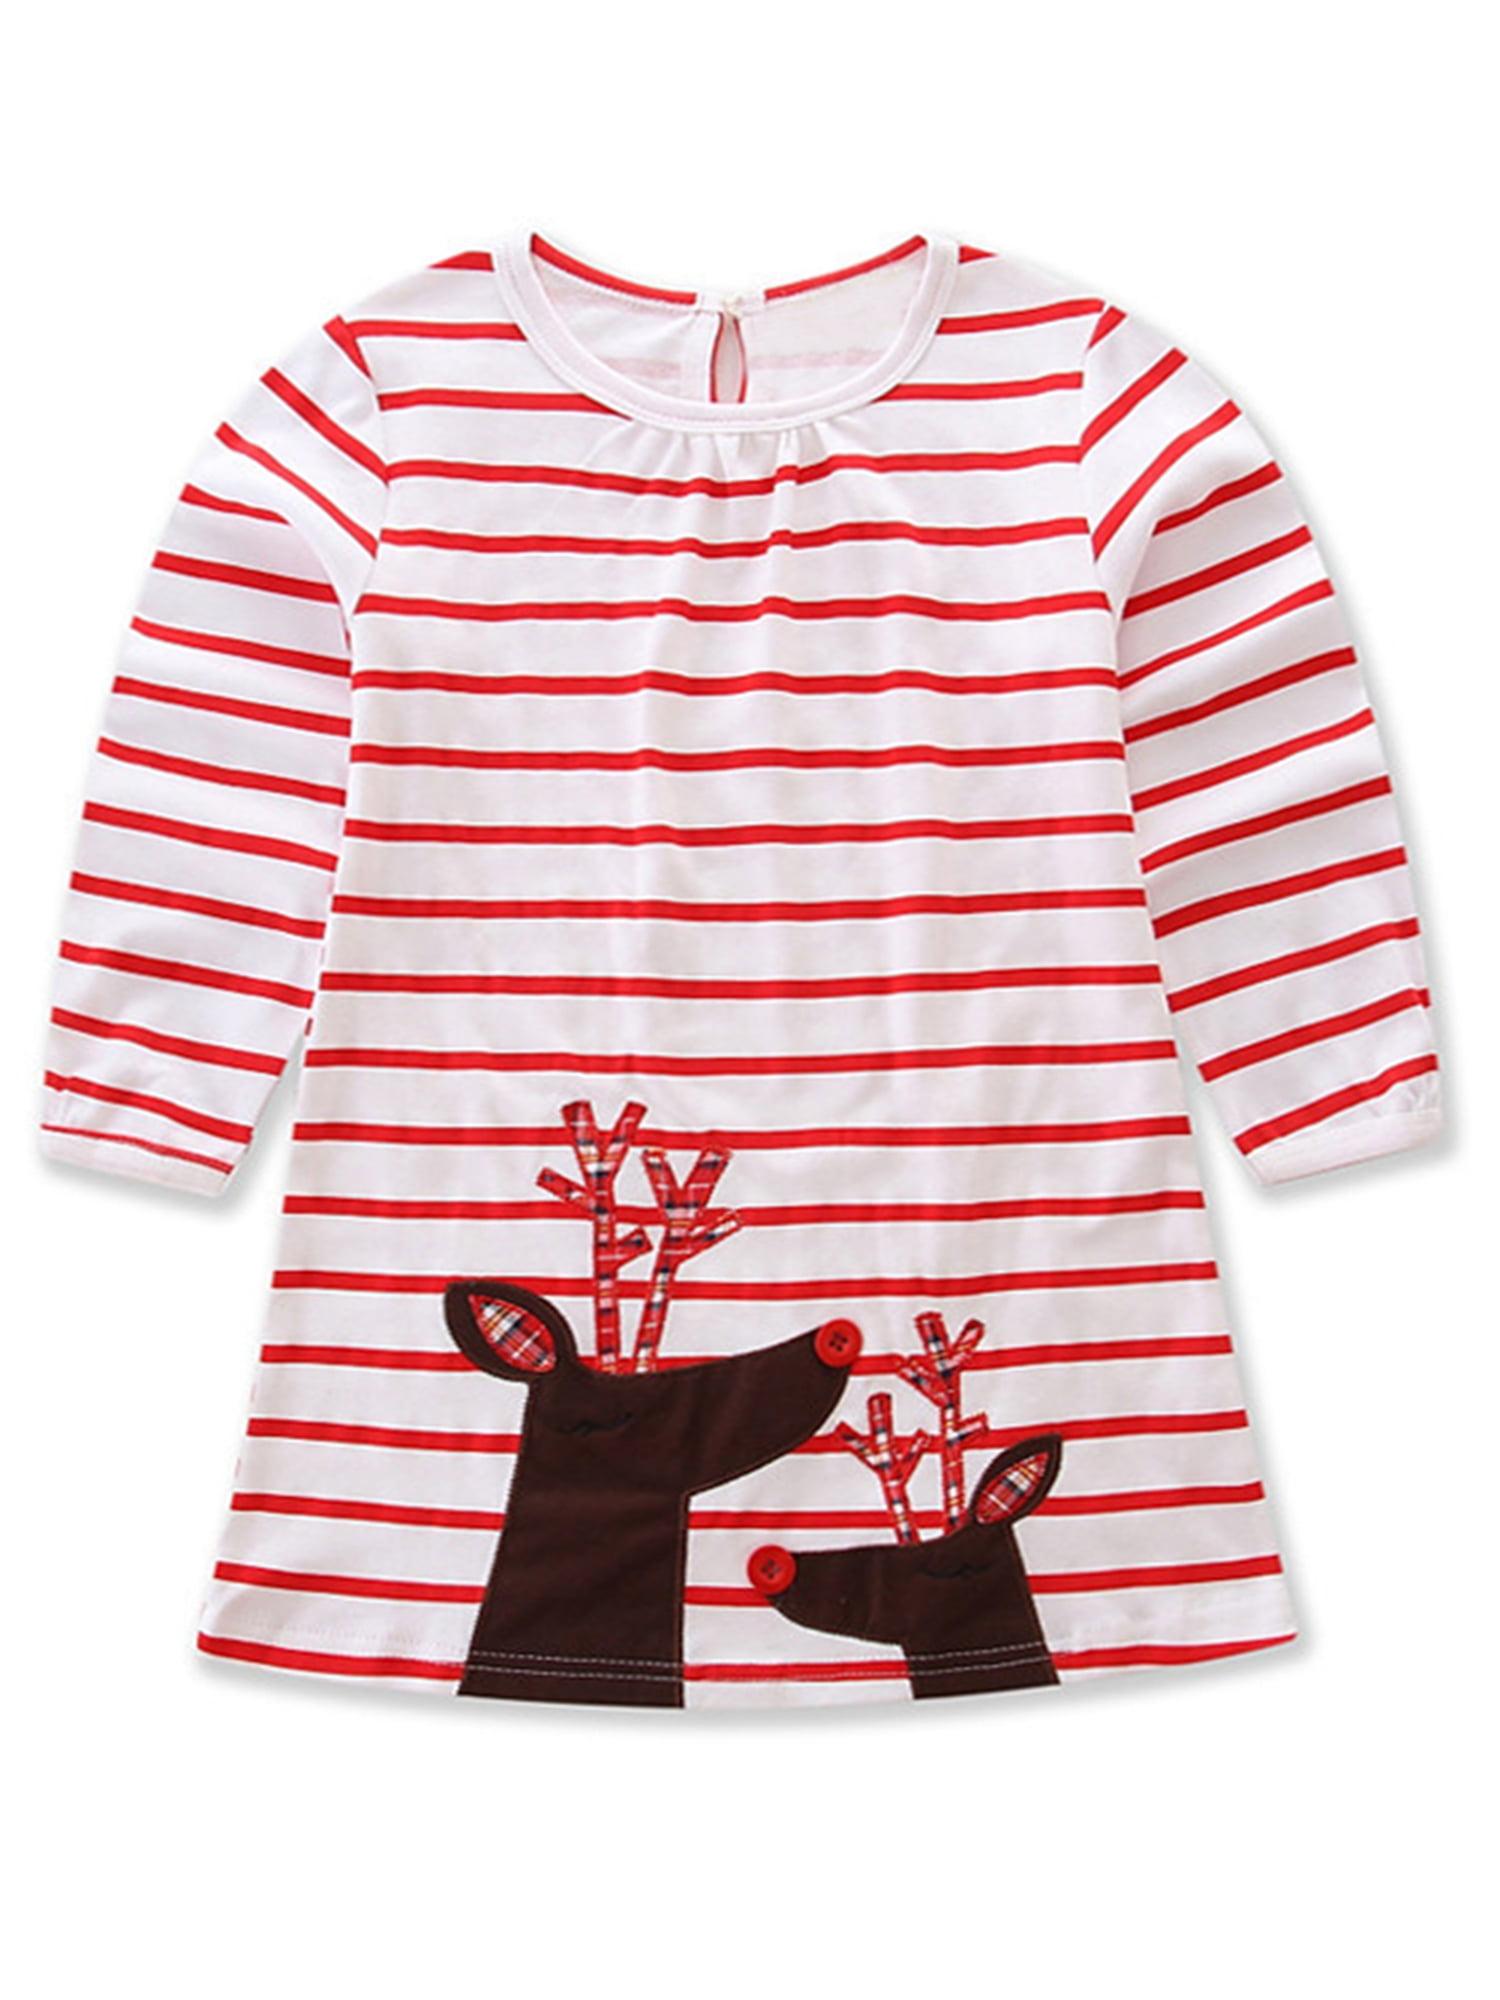 StylesILove Baby Girl Christmas Holiday Striped Print Reindeer Cotton Long Sleeve Dress (120/3-4 Years)